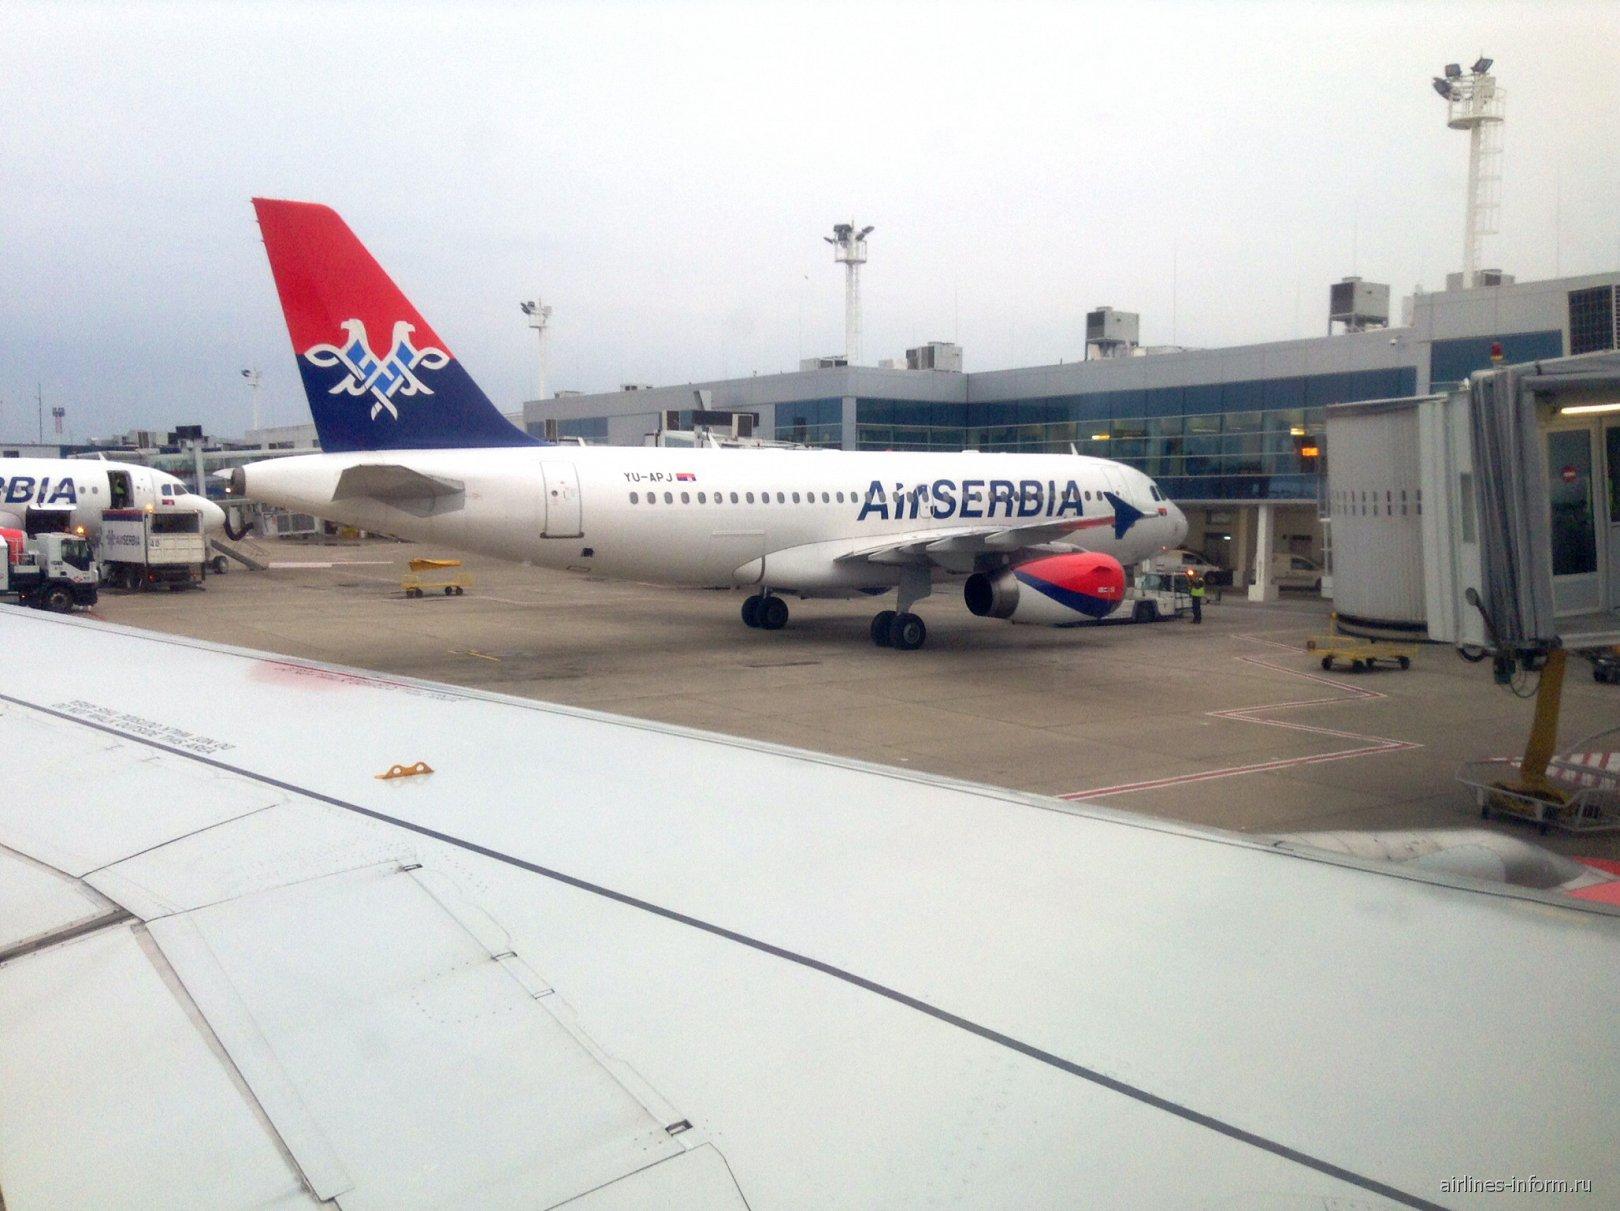 Airbus A319 Air Serbia в аэропорту Белграда